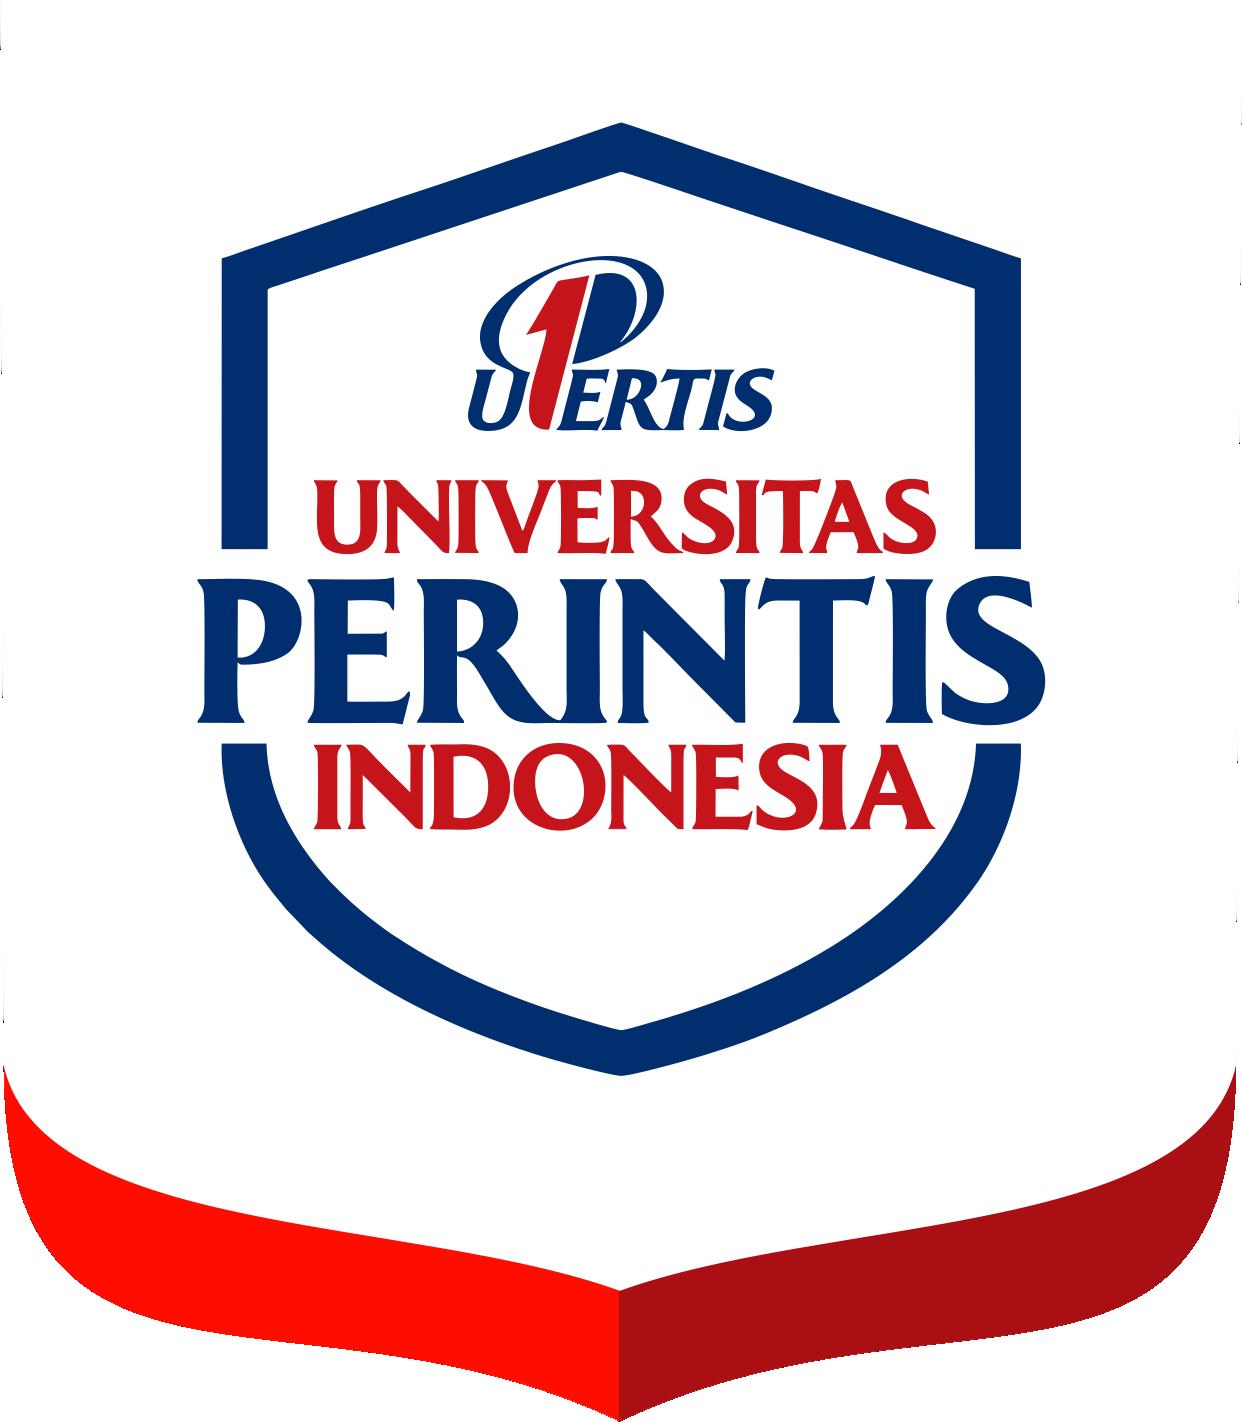 Universitas Perintis Indonesia